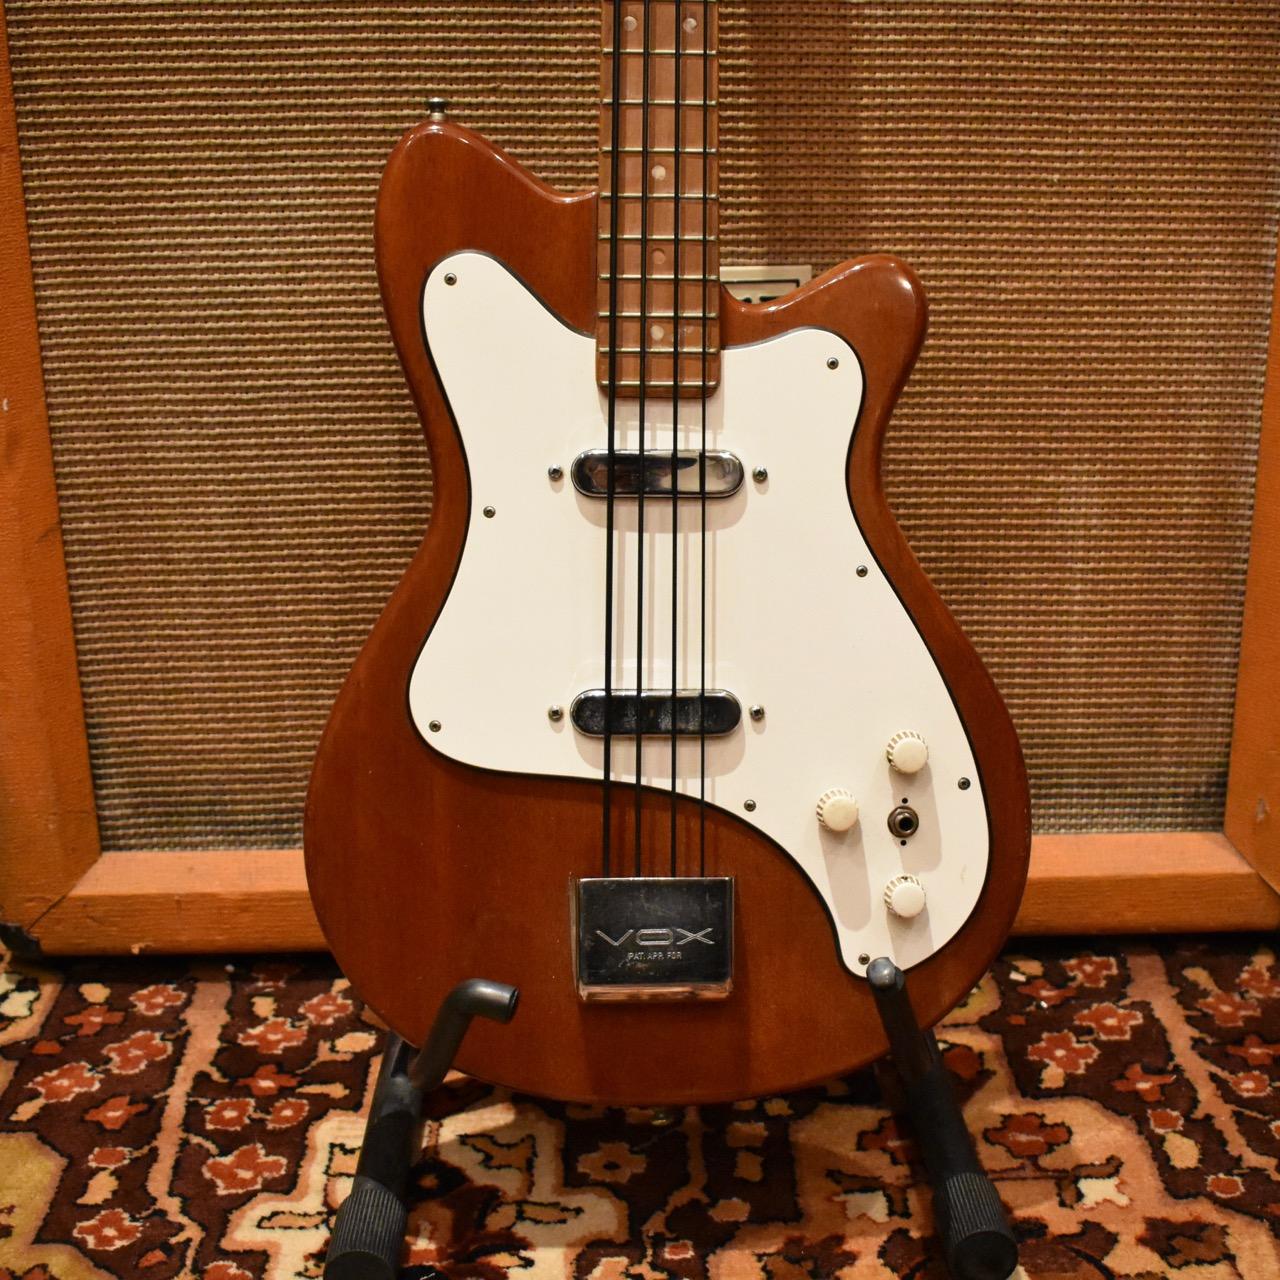 Vintage 1965 Vox Clubman Brown Electric Bass Guitar